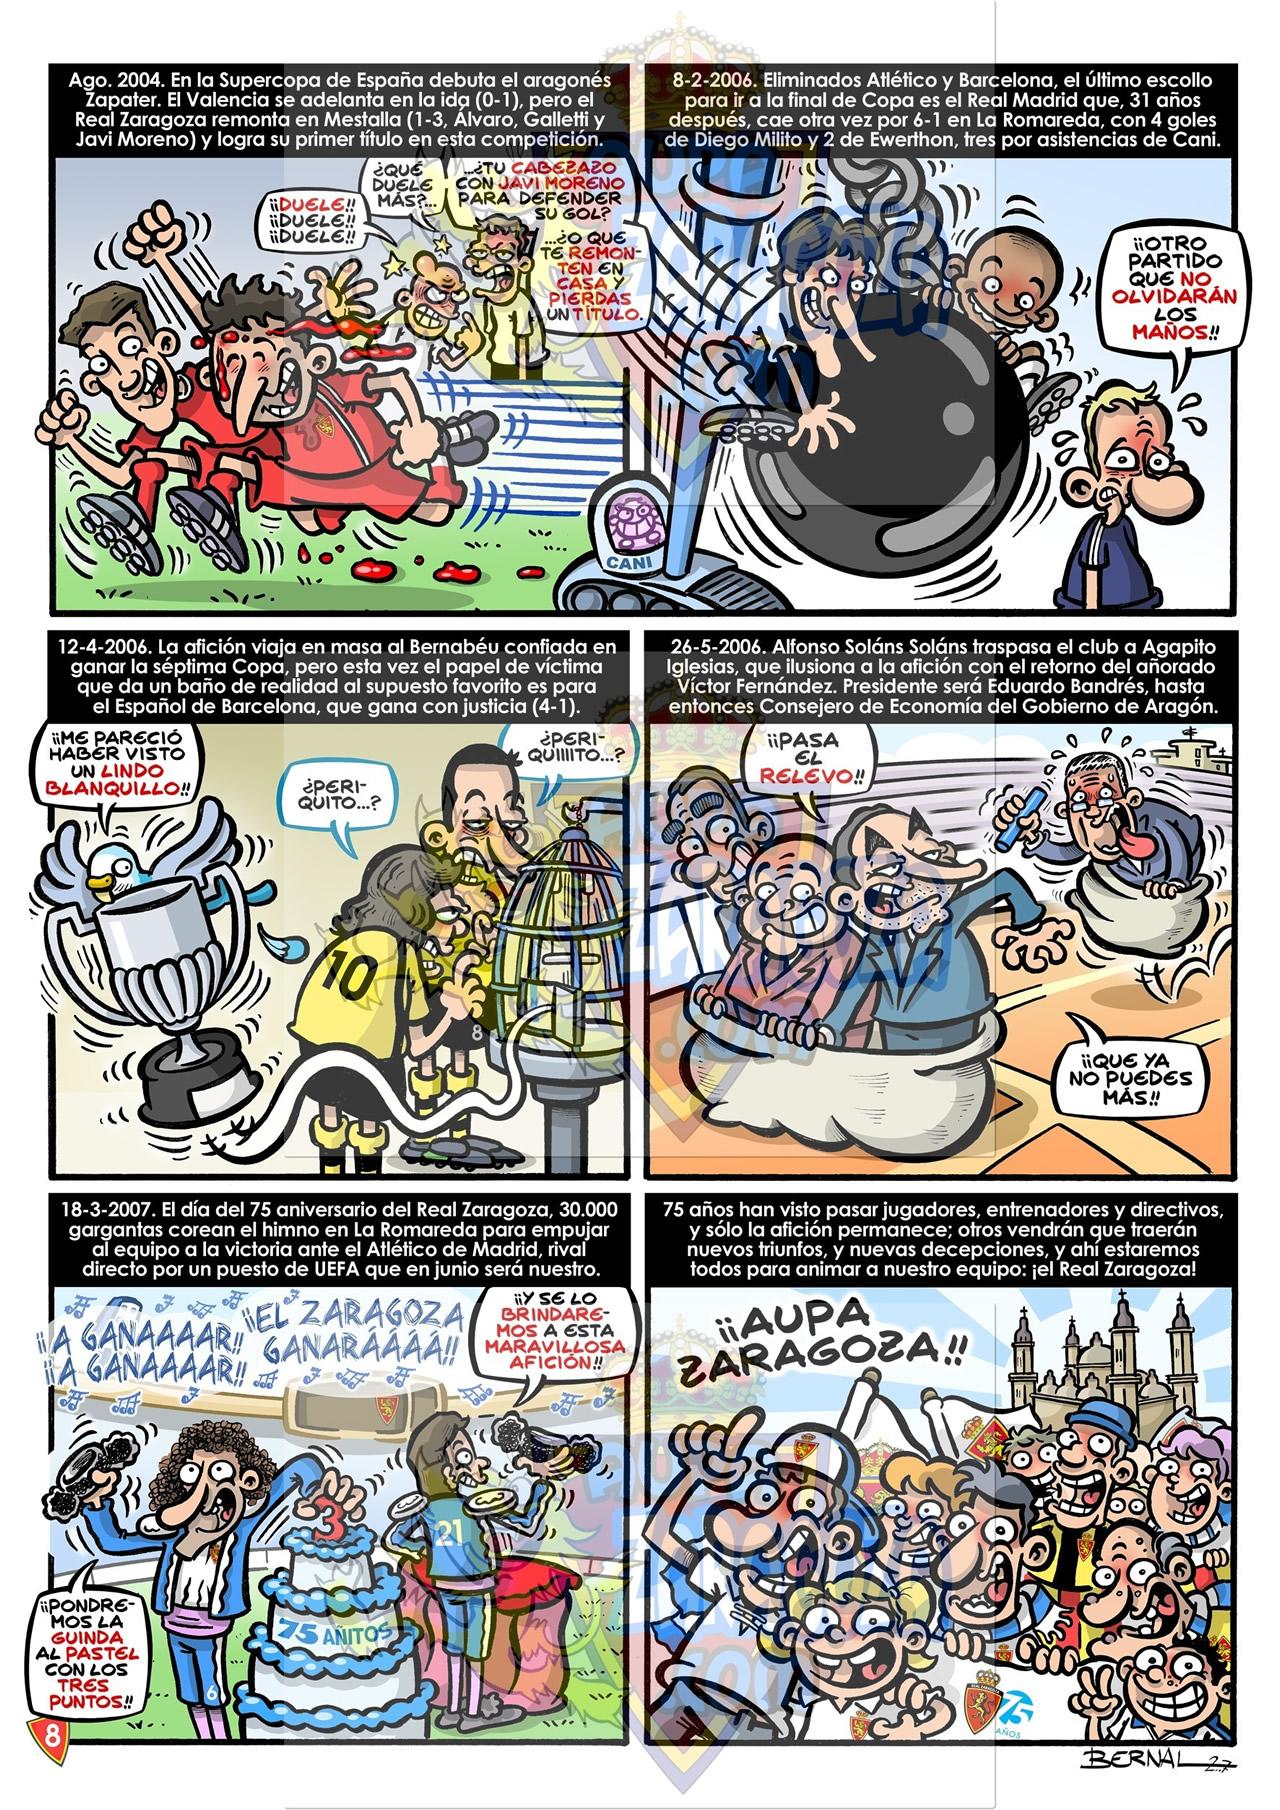 comic 75 años real zaragoza 8